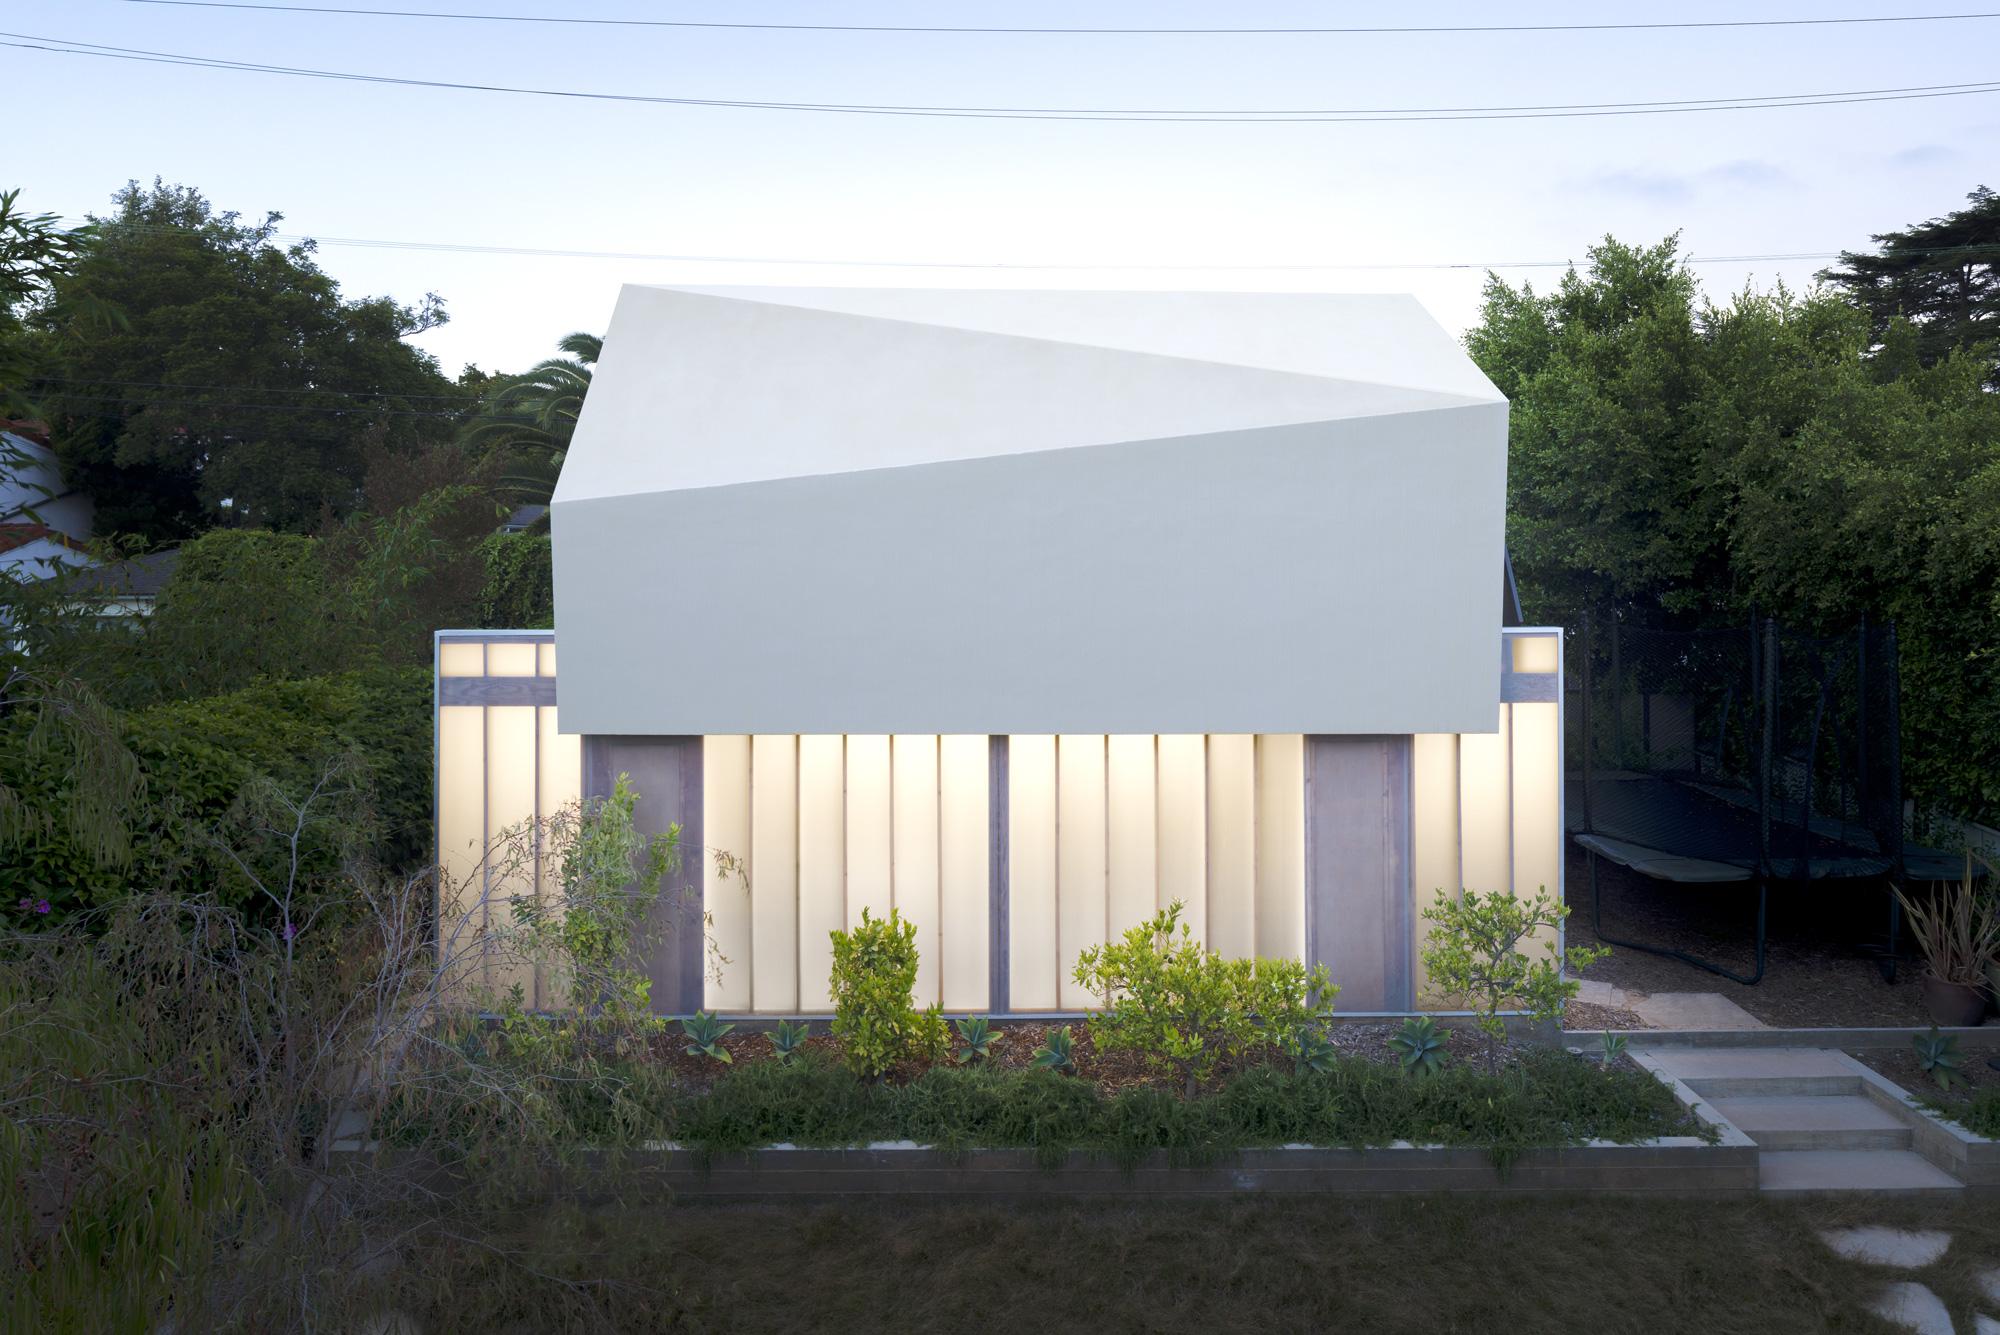 Koning Eizenberg Architecture |